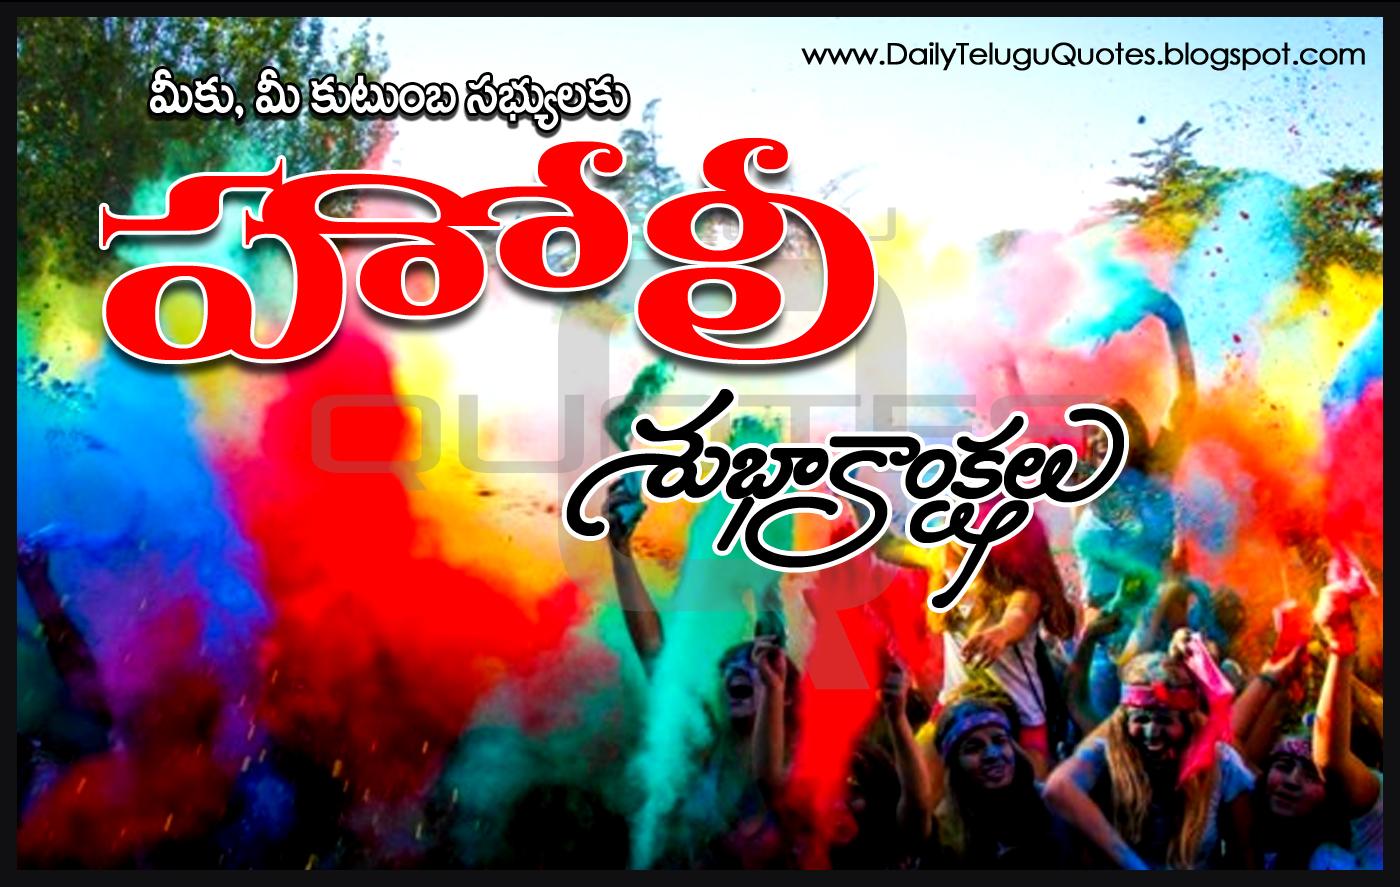 Happy holi wishes in telugu quotations hd wallpapers beautiful holi wishes in telugu holi hd wallpapers holi m4hsunfo